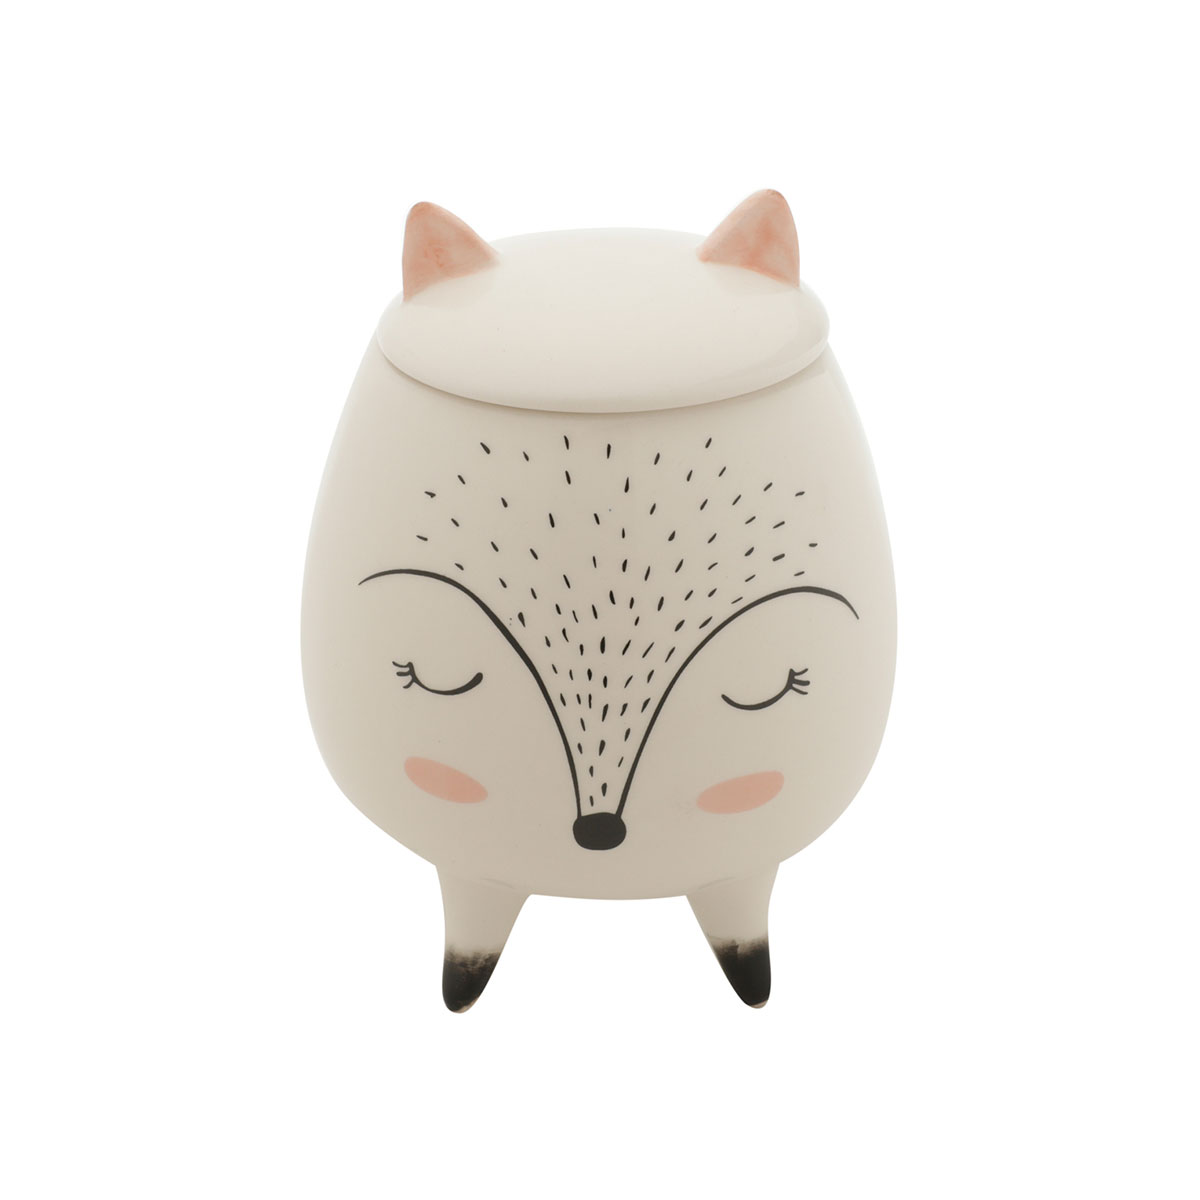 Vaso Potiche Decorativo Cerâmica Raposa Sleeping Fox - Presente Super